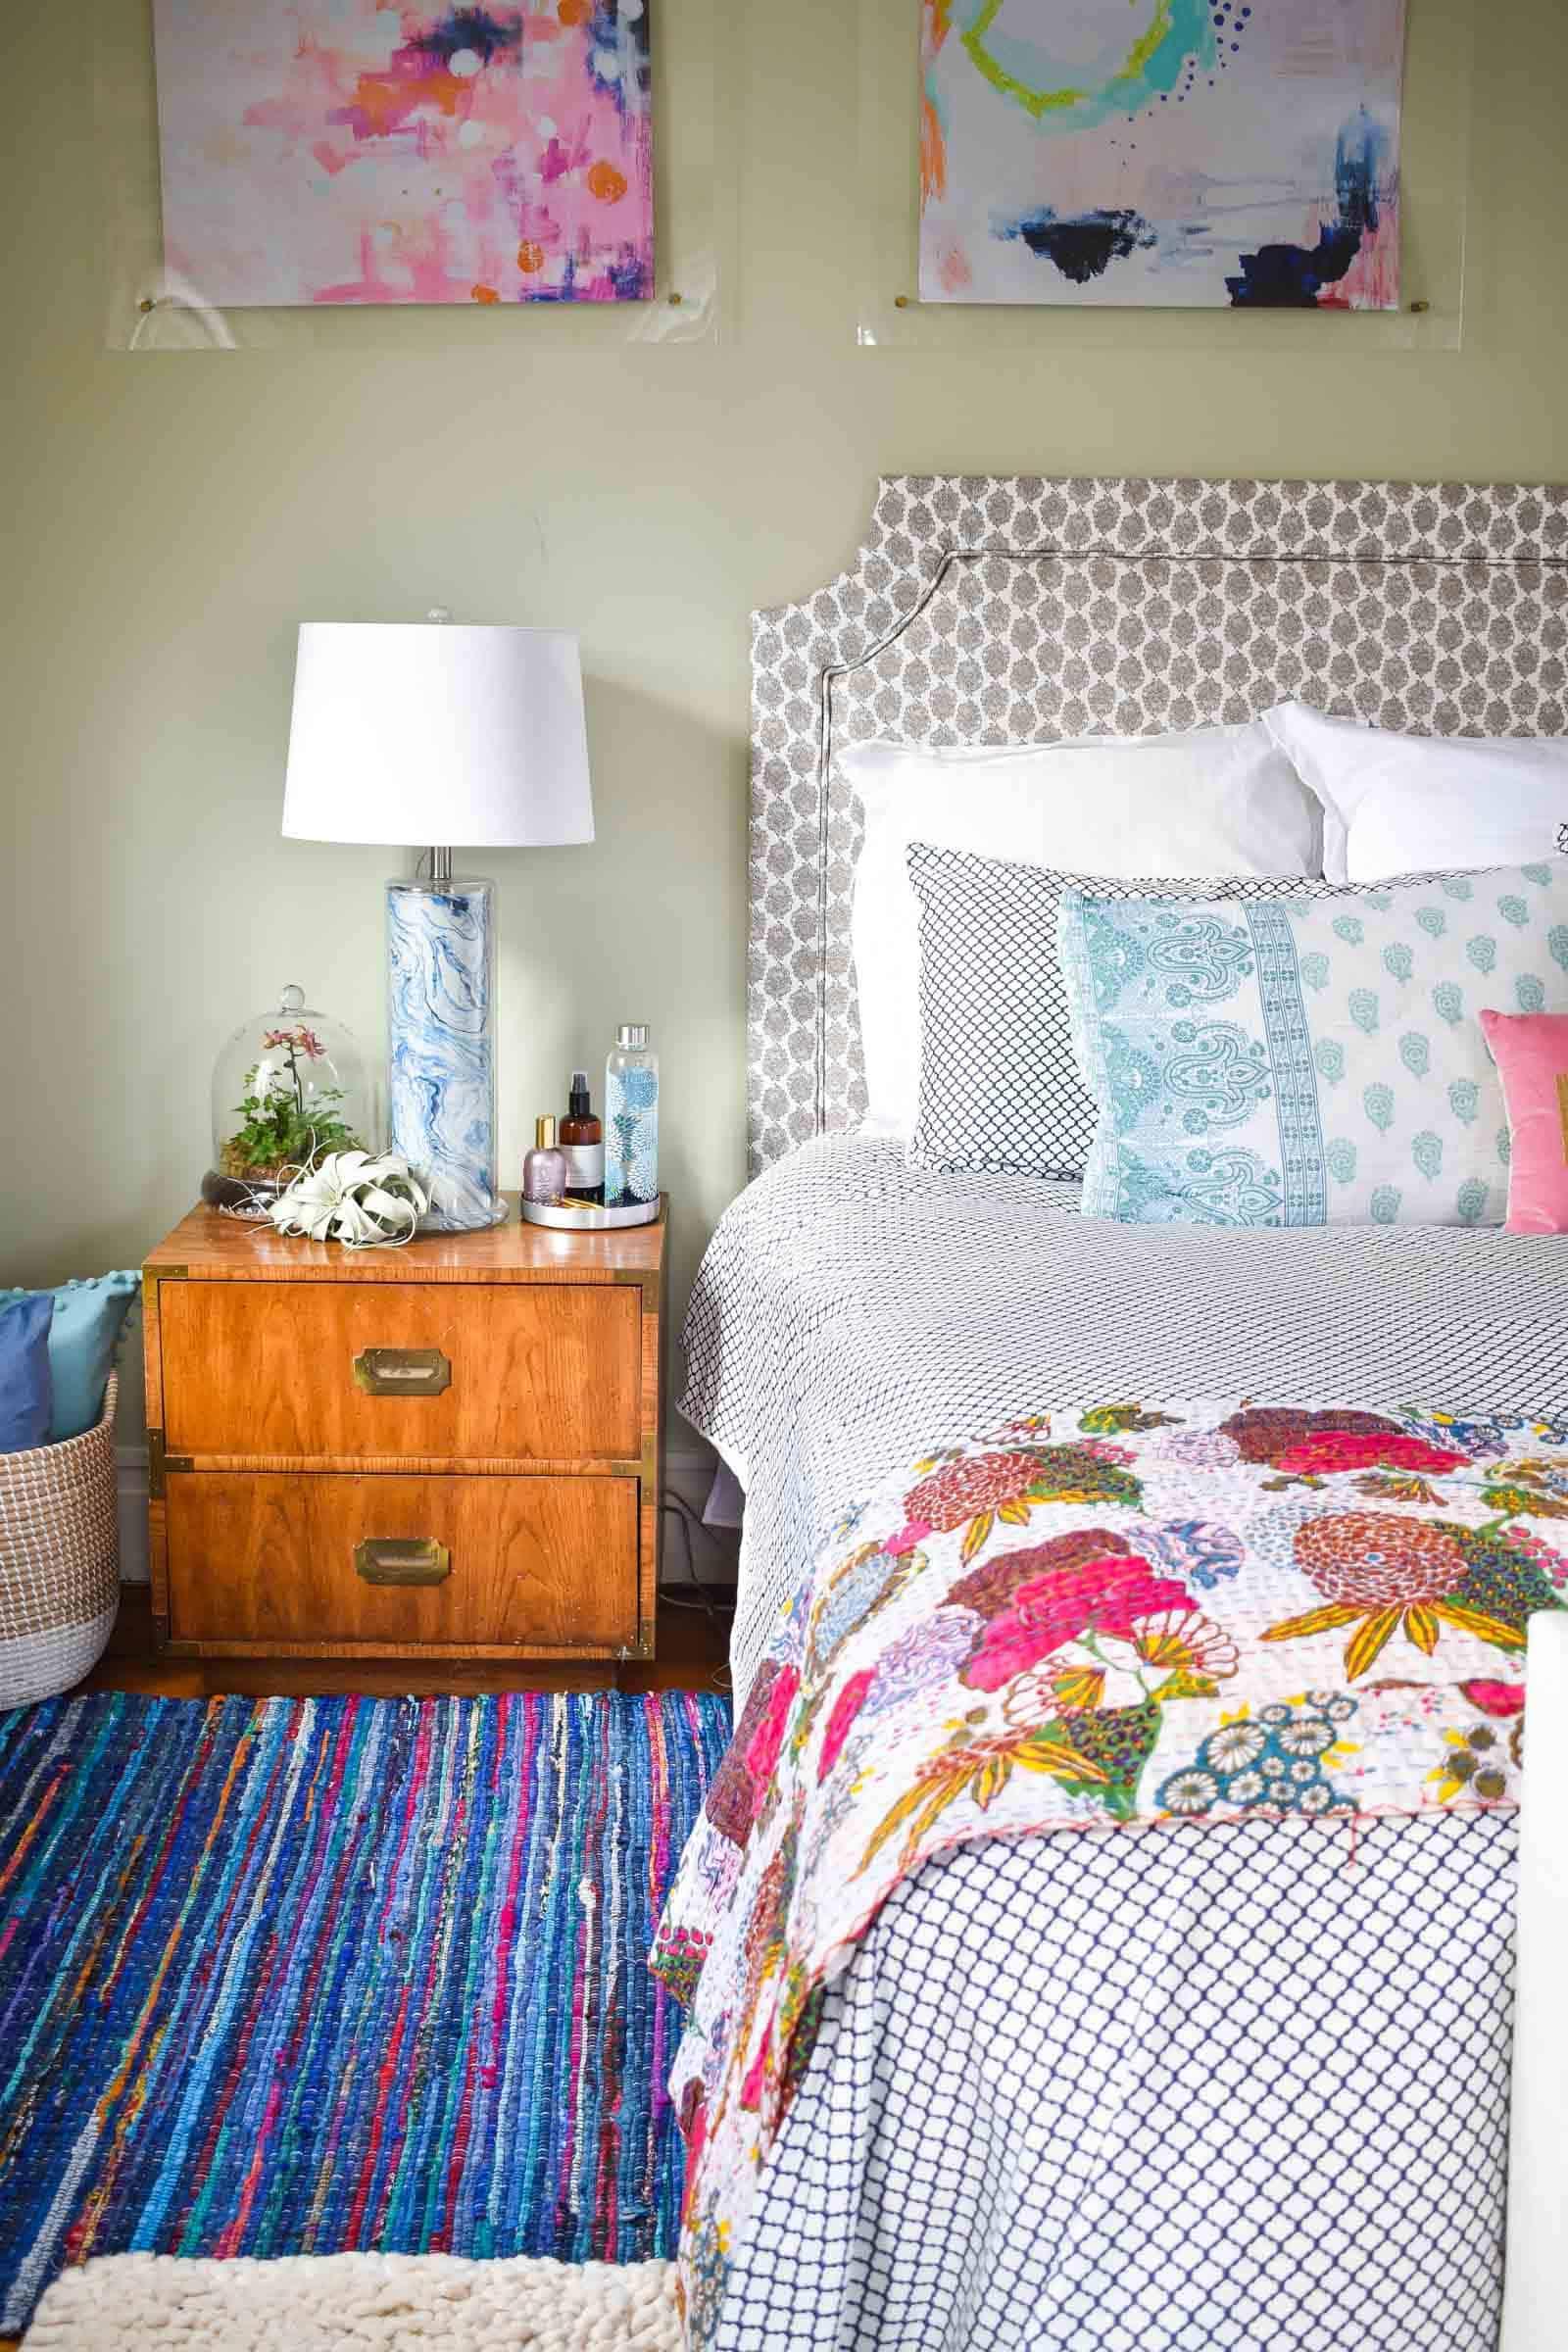 rag rug next to bed in master bedroom